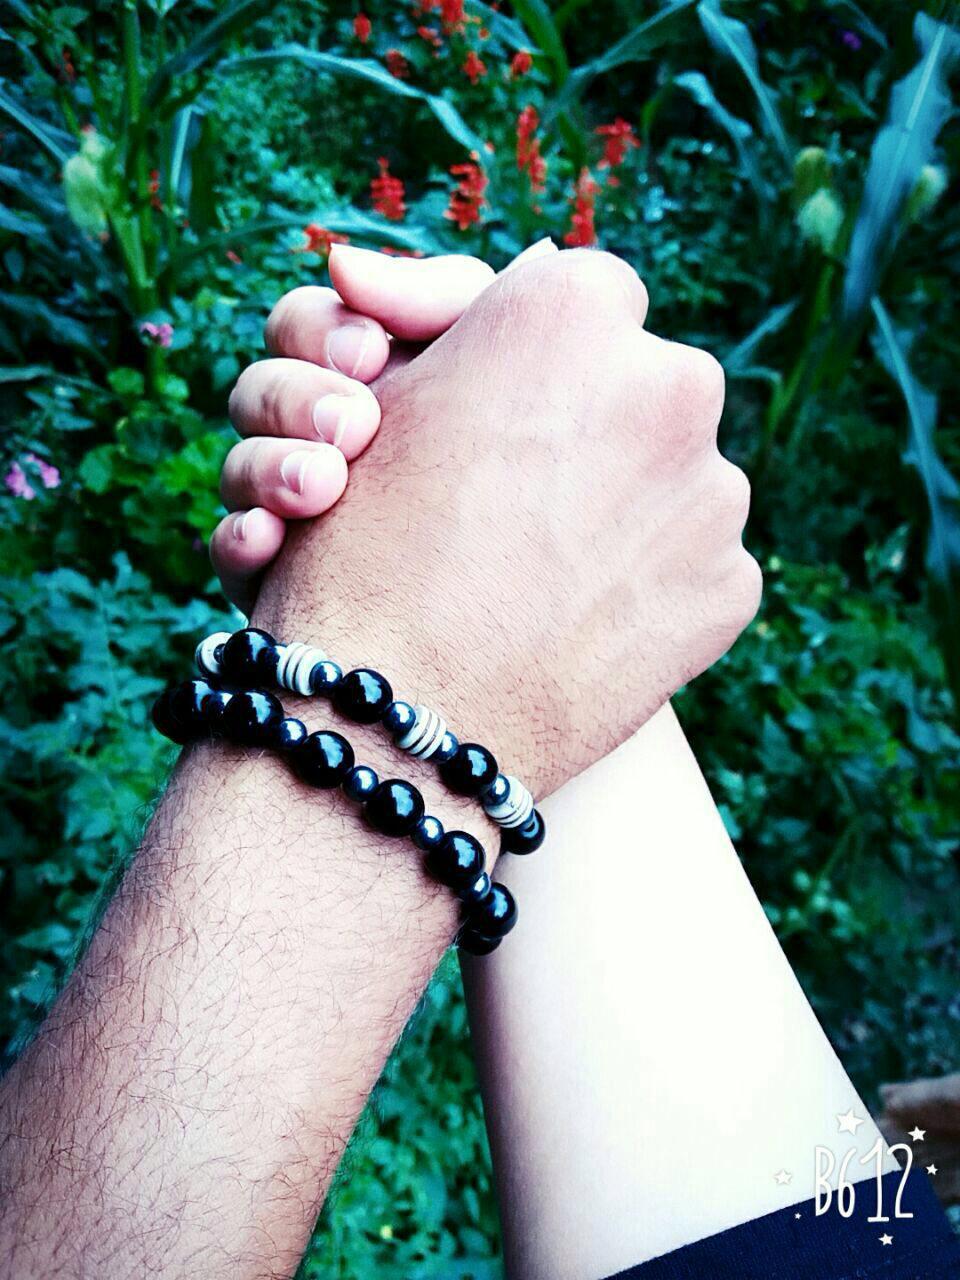 دست تو دست عشقم